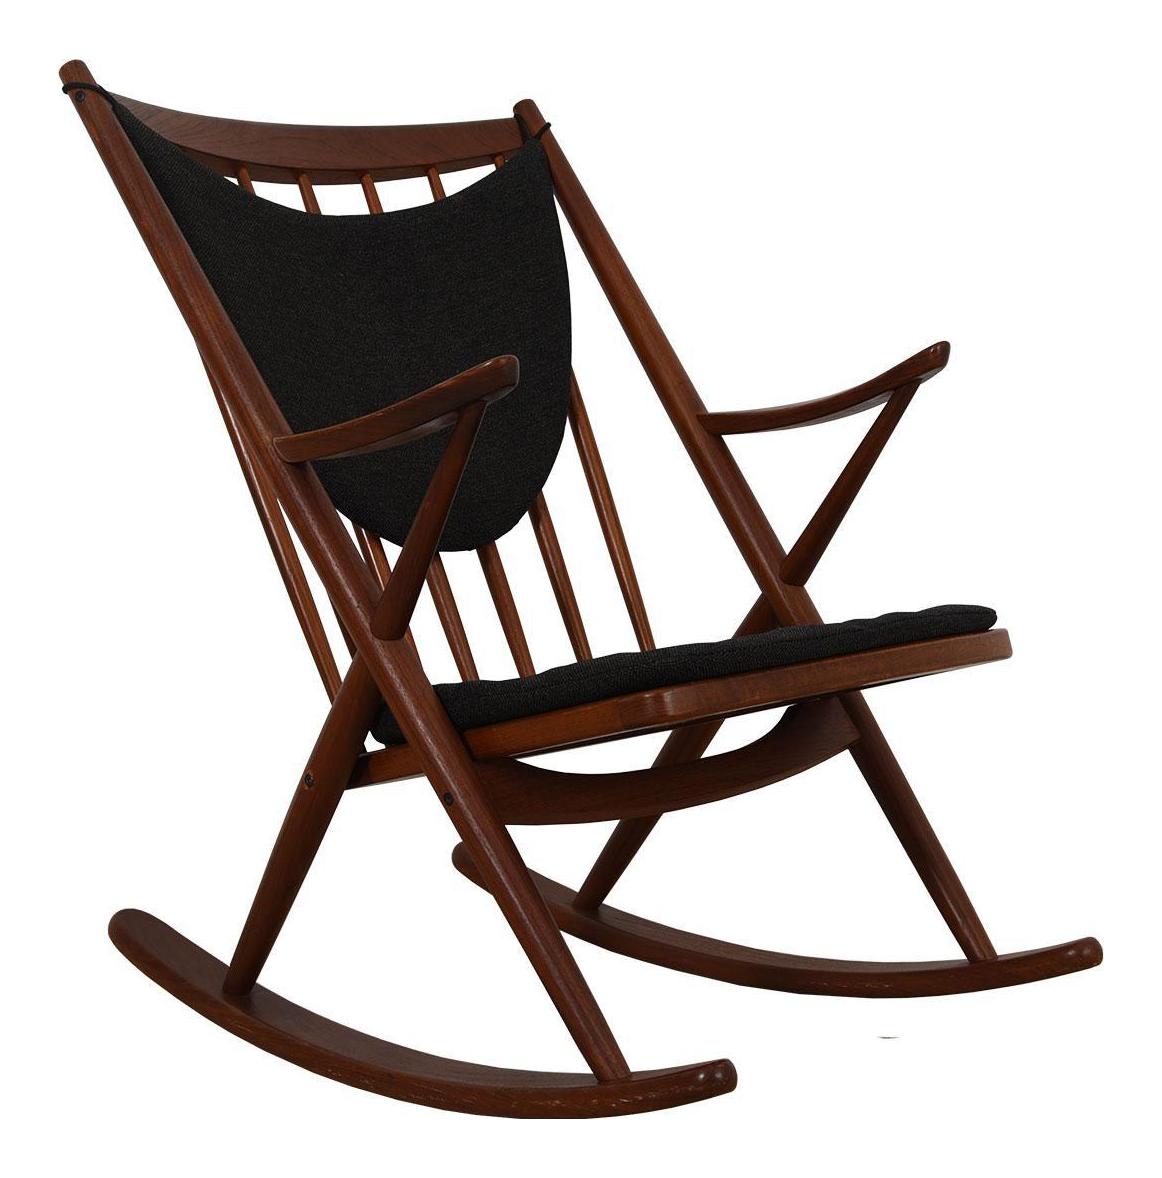 Danish Modern Rocking Chair In Teak By Bramin, Denmark